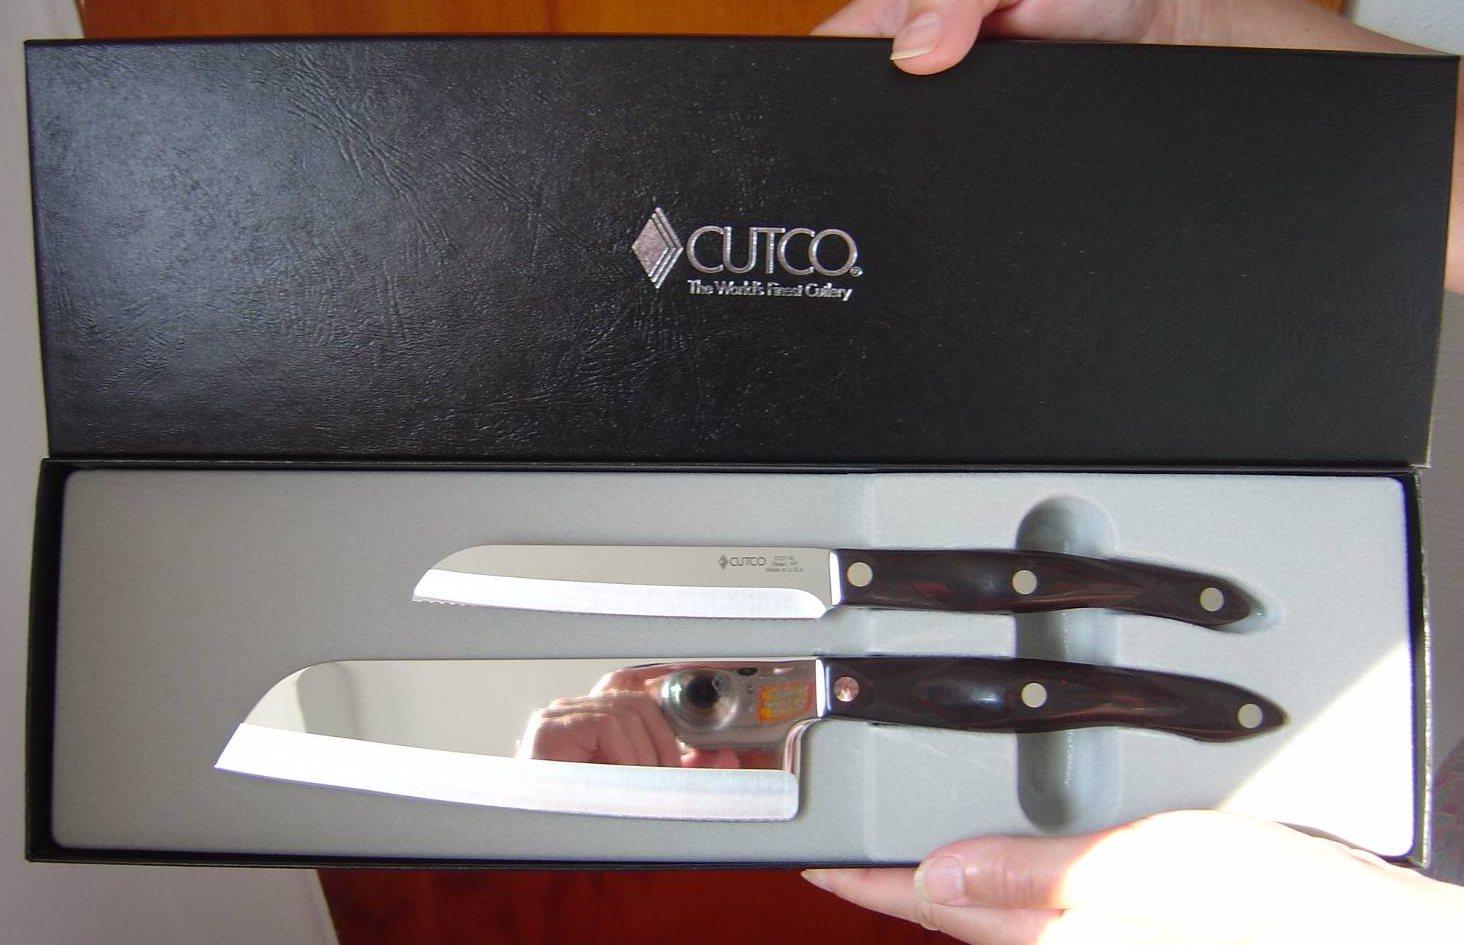 CUTCO Cutlery AMERICAN MADE Santoku-Style Cook's Combo Set .jpeg